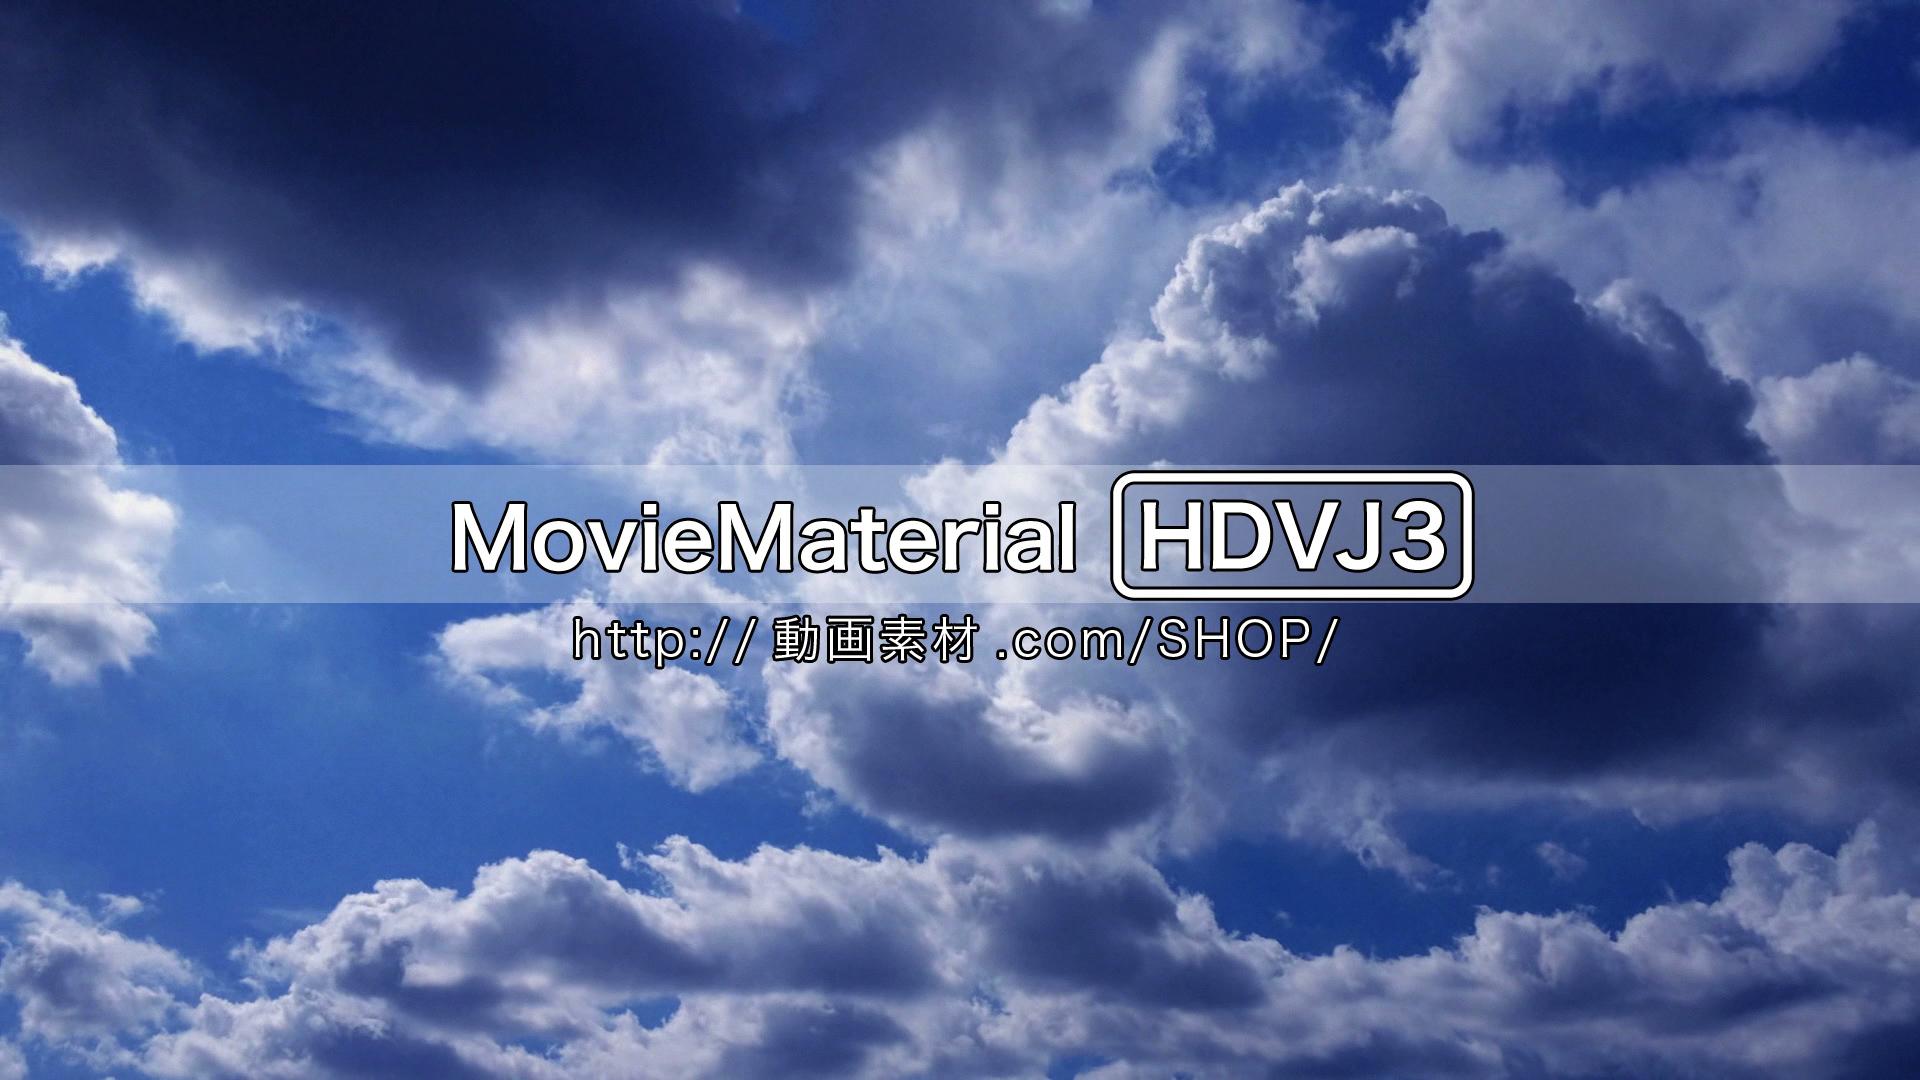 MovieMaterial HDVJ3 フルハイビジョンVJ動画素材集 画像5